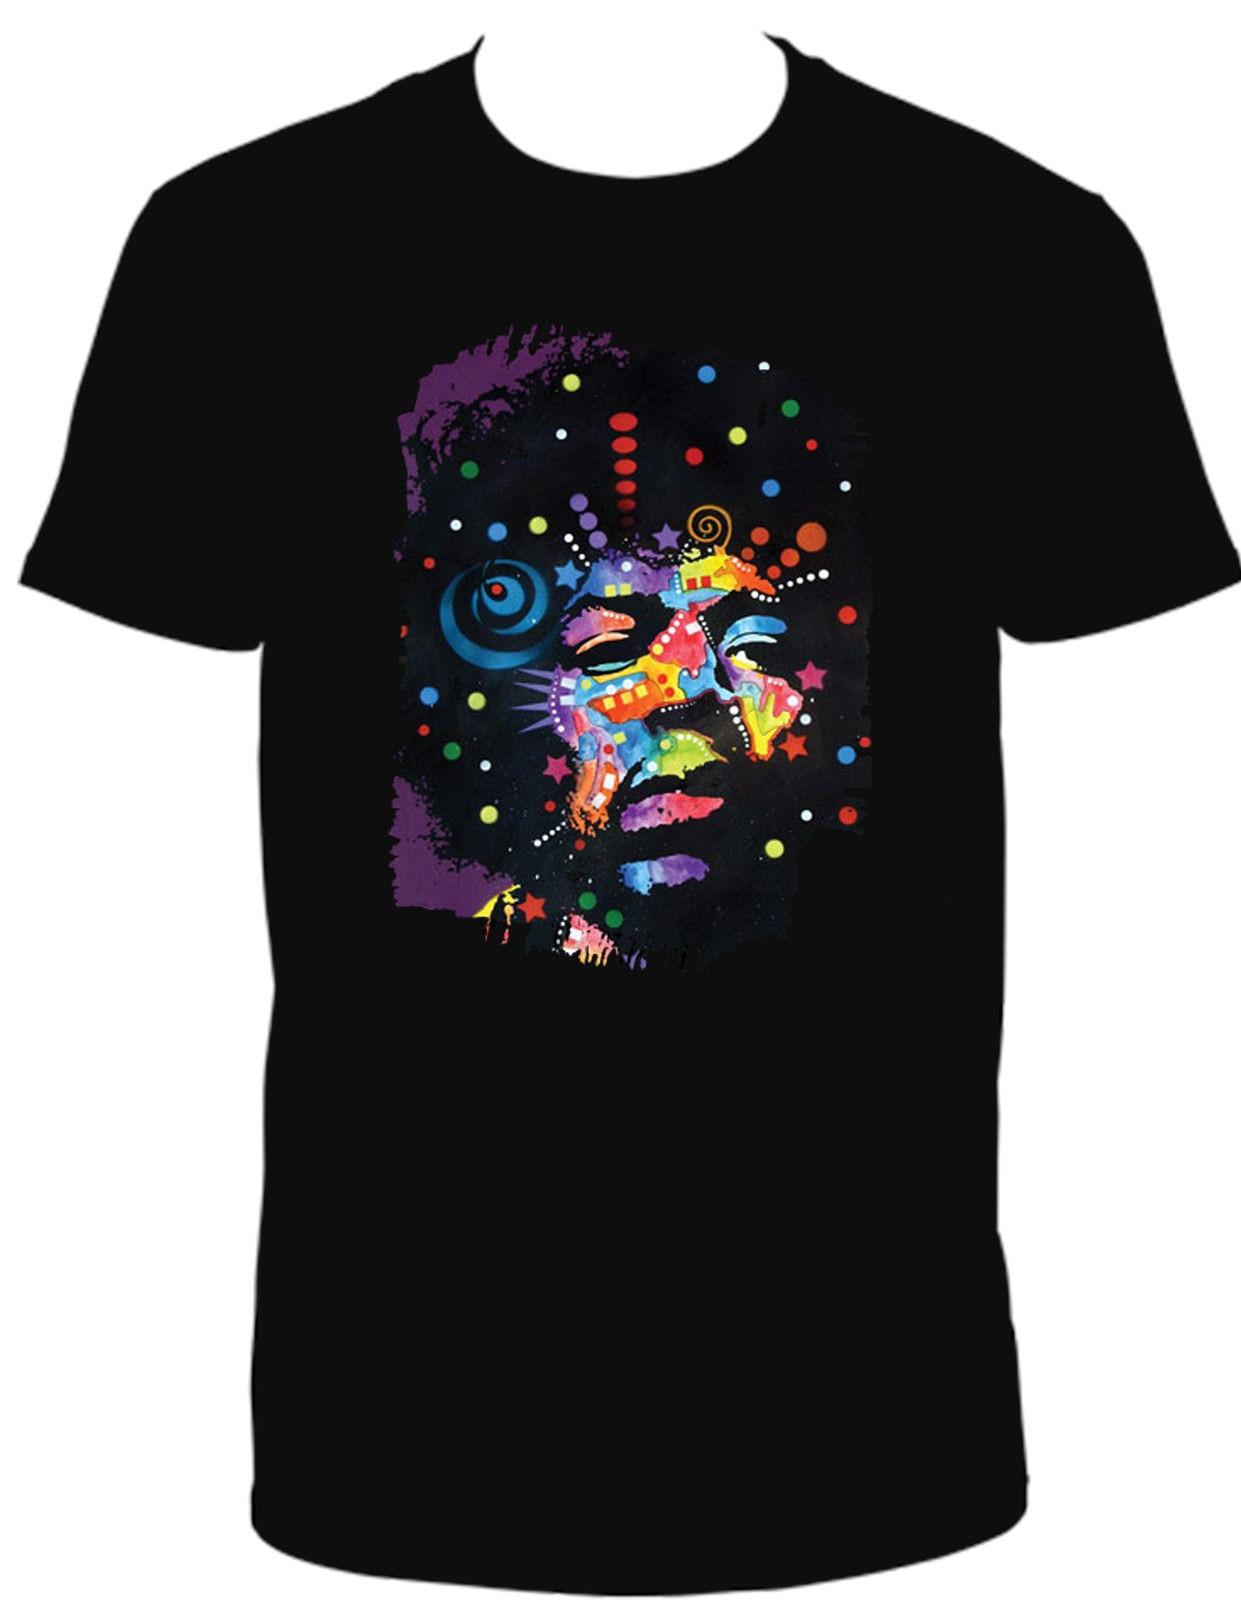 Black t shirt with neon letters - Jimi Hendrix Black Light Neon T Shirt Nieznajomego Rzeczy Print T Shirty Oryginalny China